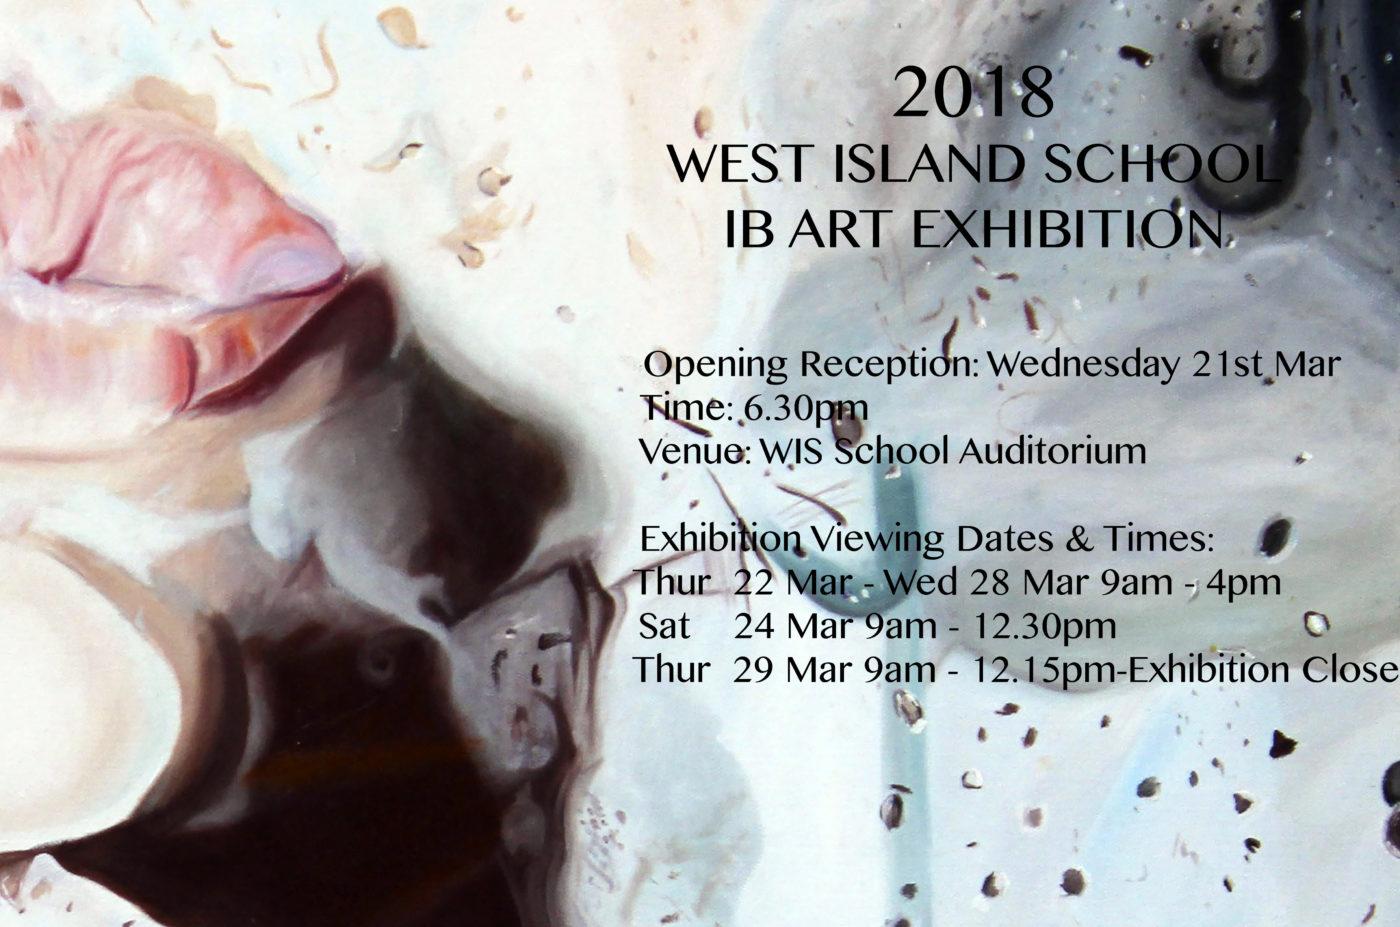 West Island School Esf E Invite Ib Art Exh 2018 1 West Island